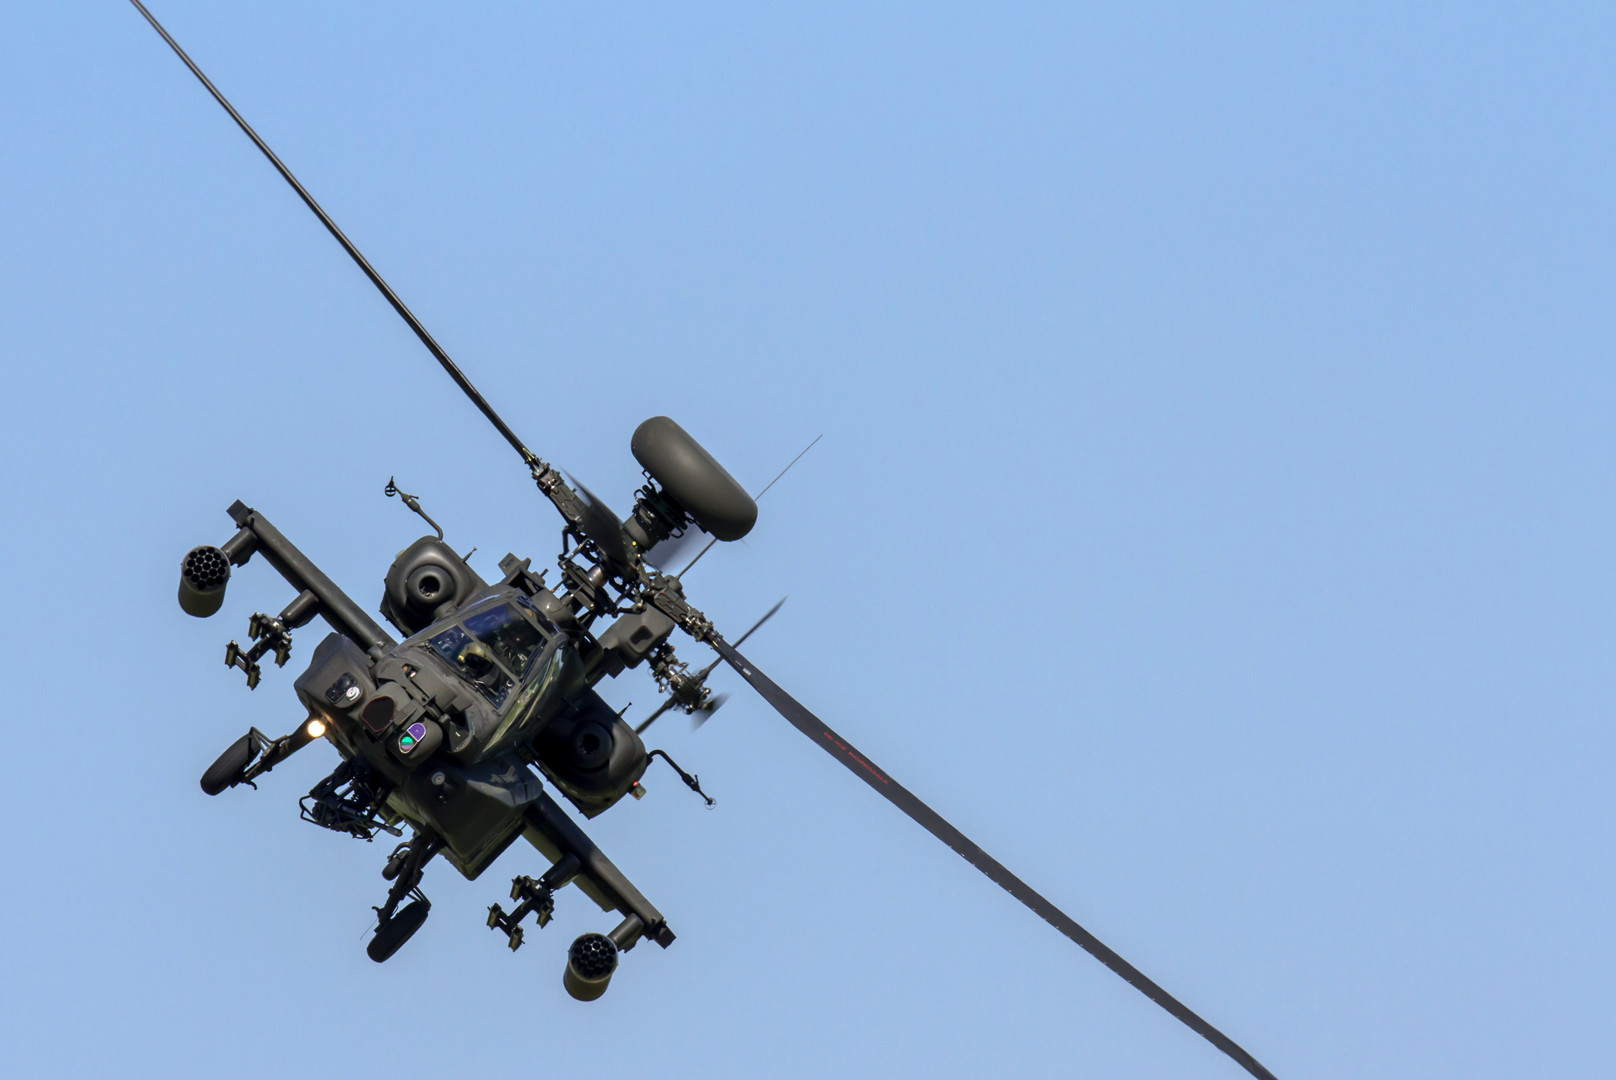 AH-64 Longbow Apache